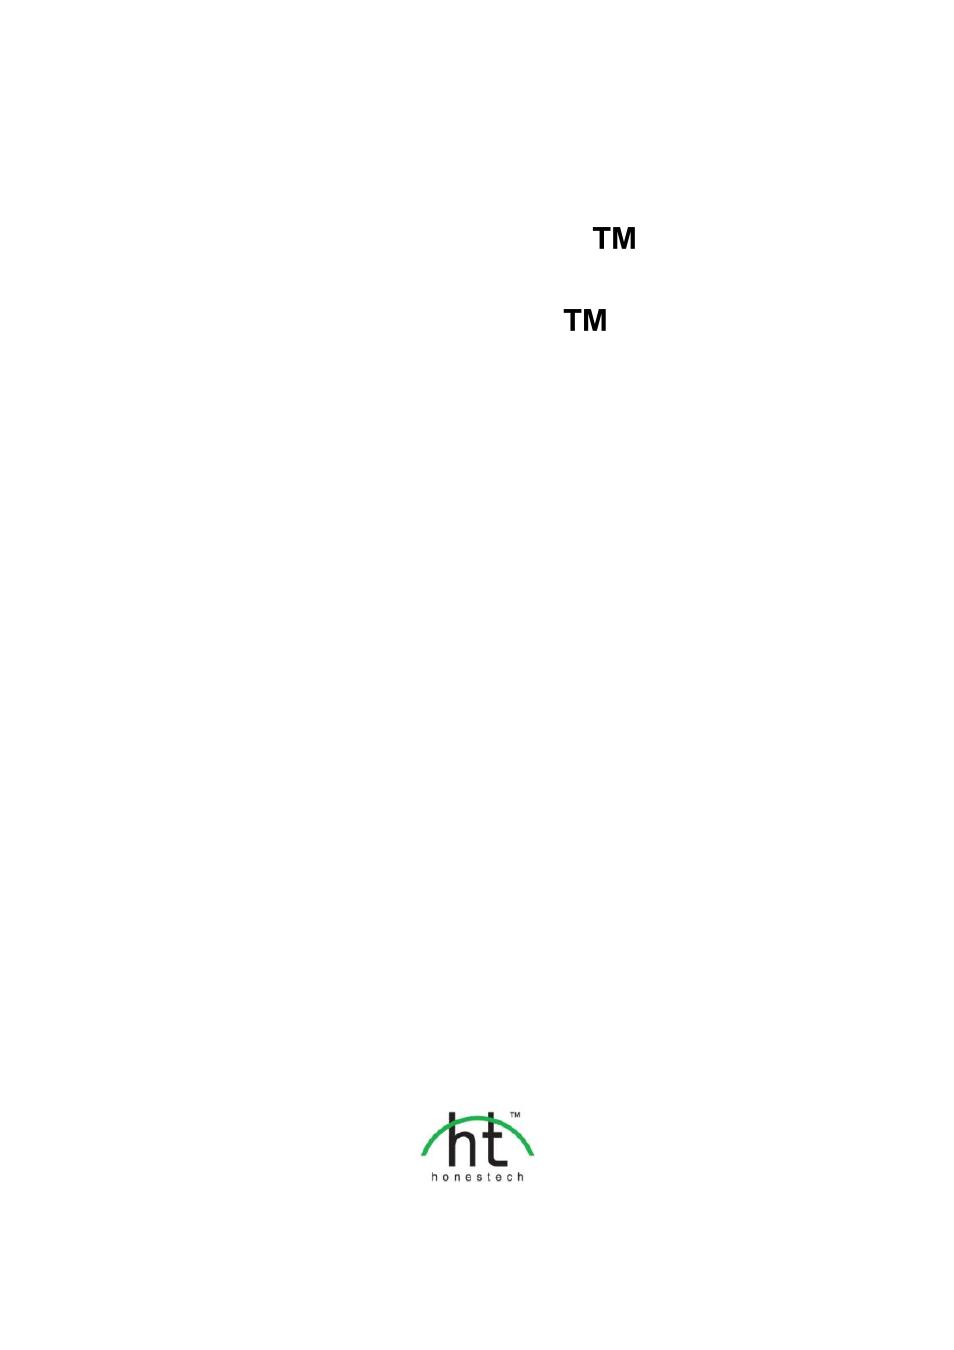 honestech vhs to dvd 7.0 deluxe manual